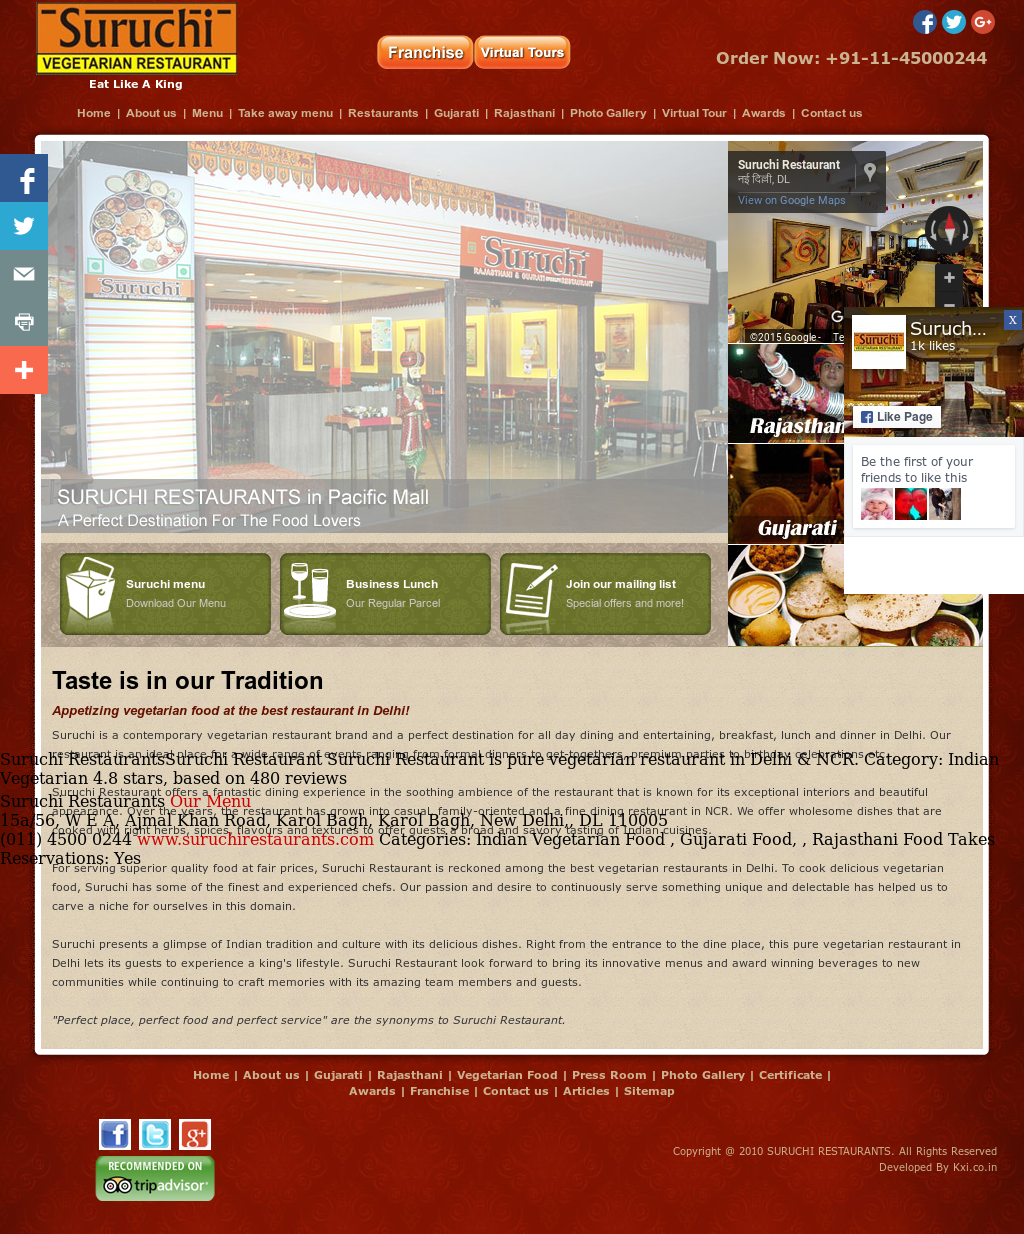 Suruchi Restaurants Competitors, Revenue and Employees - Owler